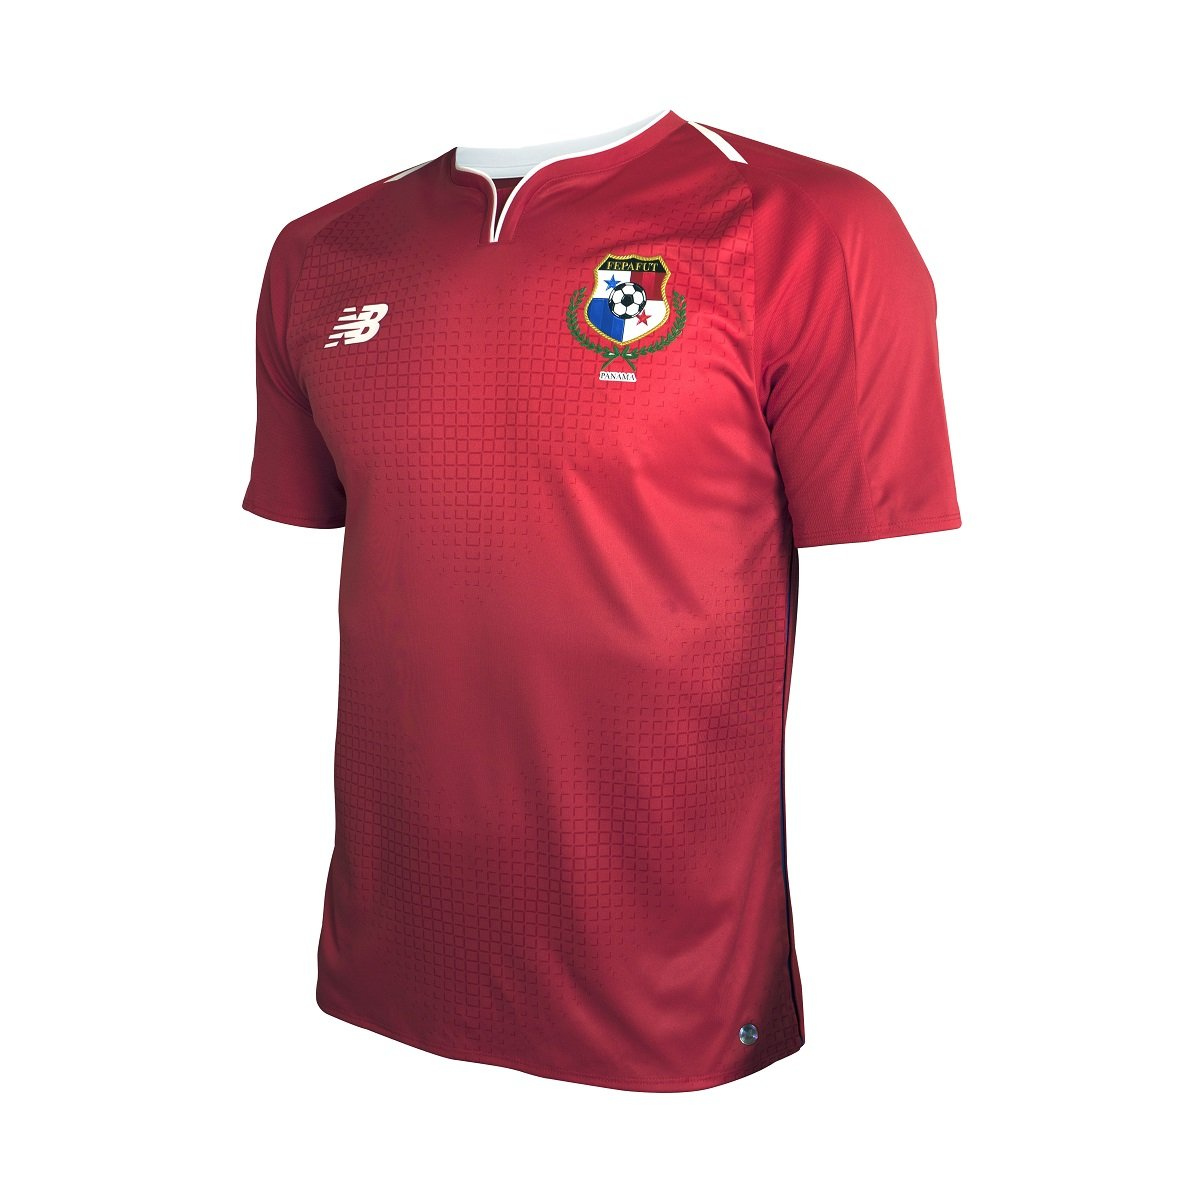 bc339732b34 Amazon.com: New Balance Panama Home Soccer Men's Jersey FIFA World Cup  Russia 2018 (S): Clothing